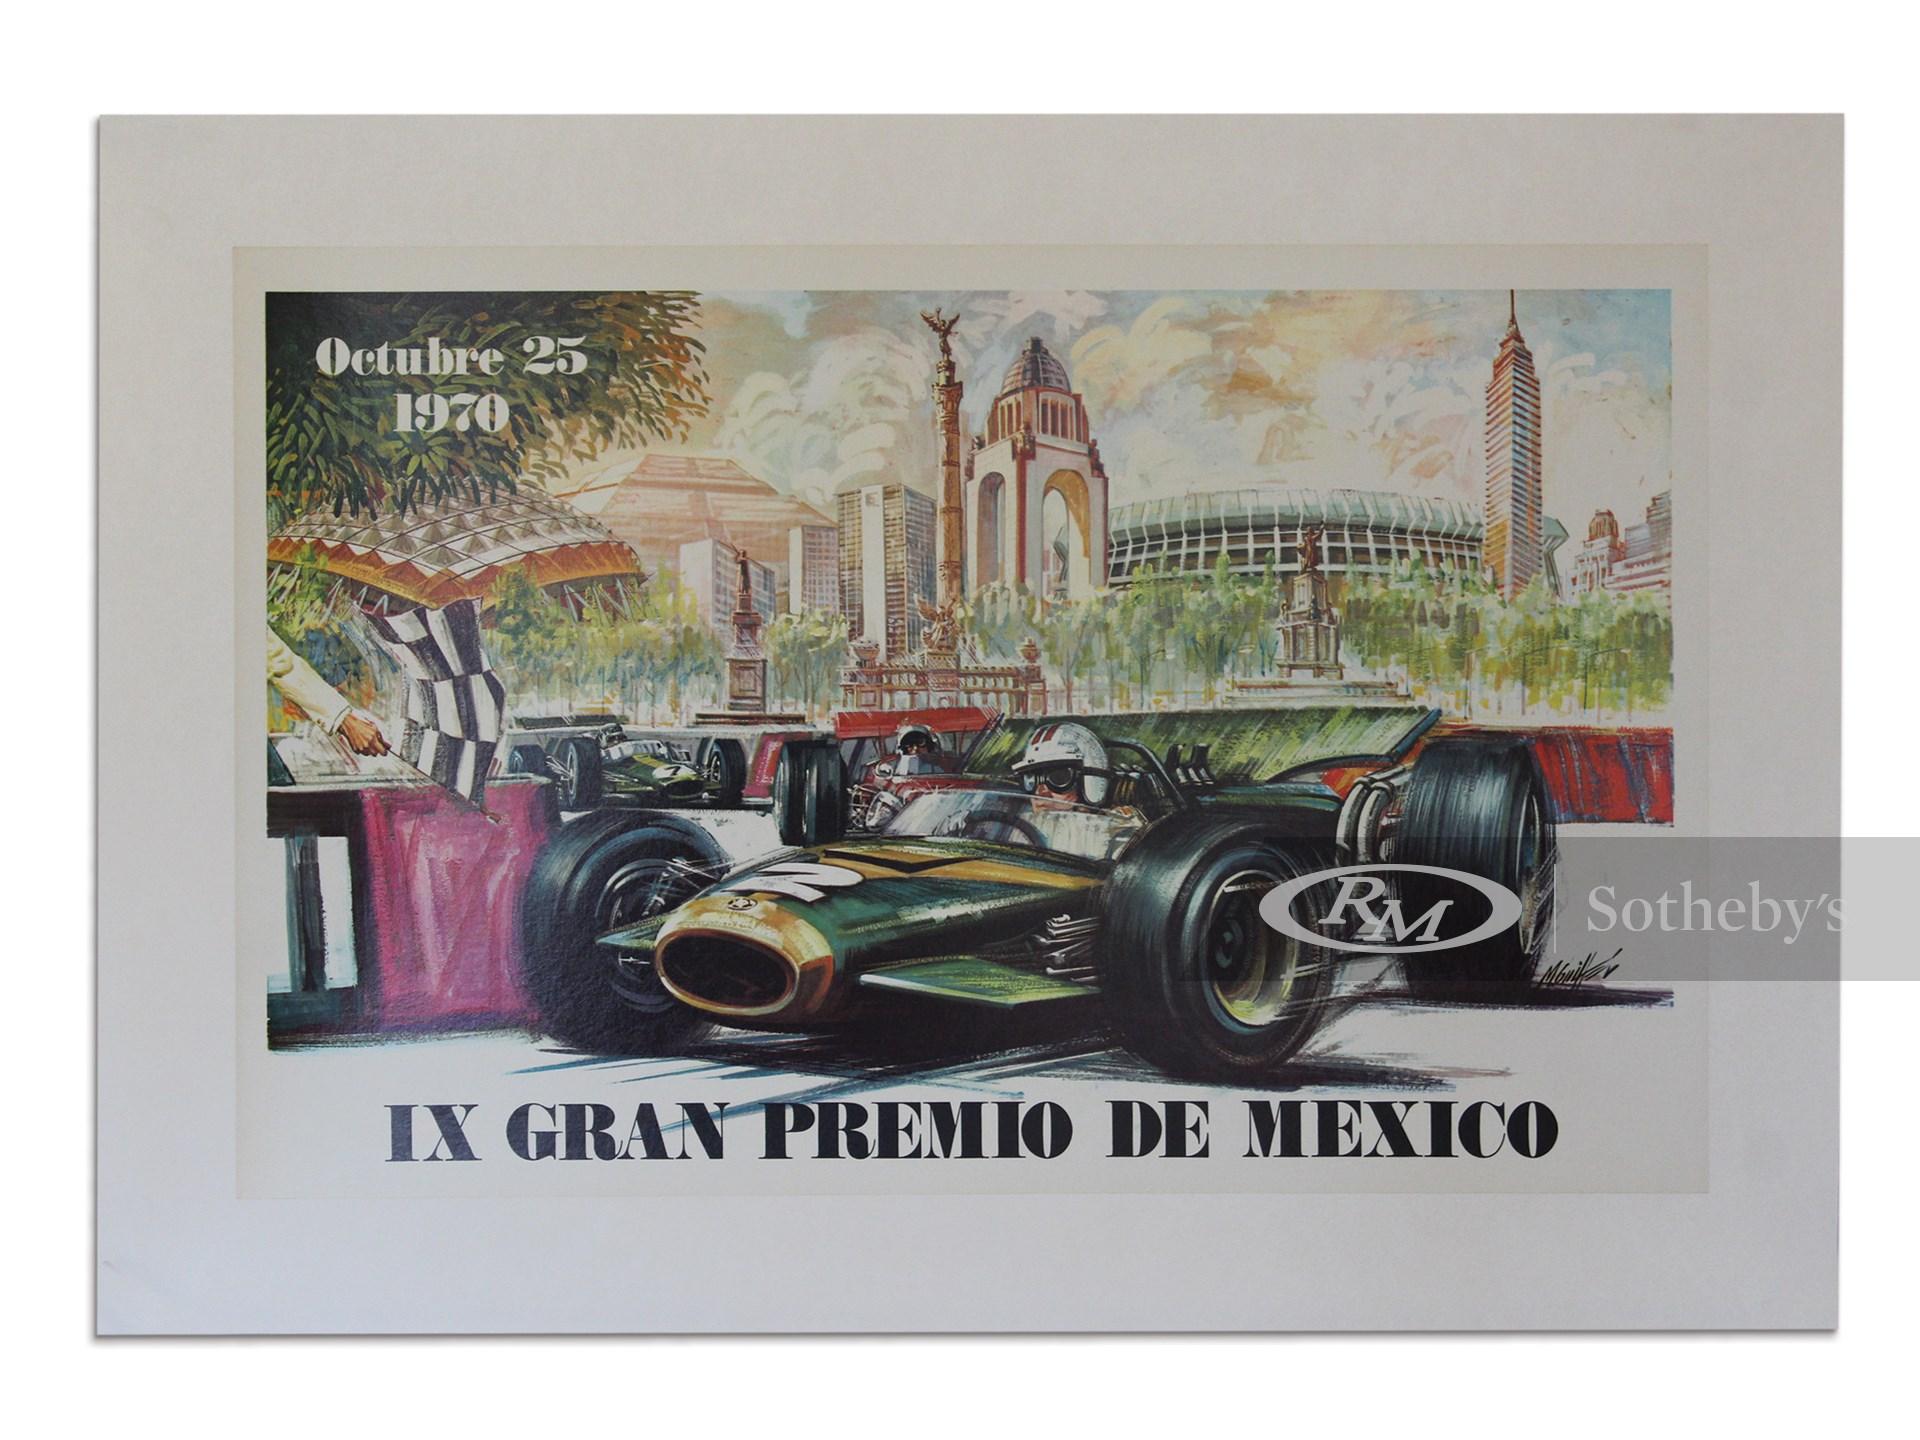 """IX Gran Premio de Mexico Octobre 25 1970"" Grand Prix of Mexico Event Poster -"